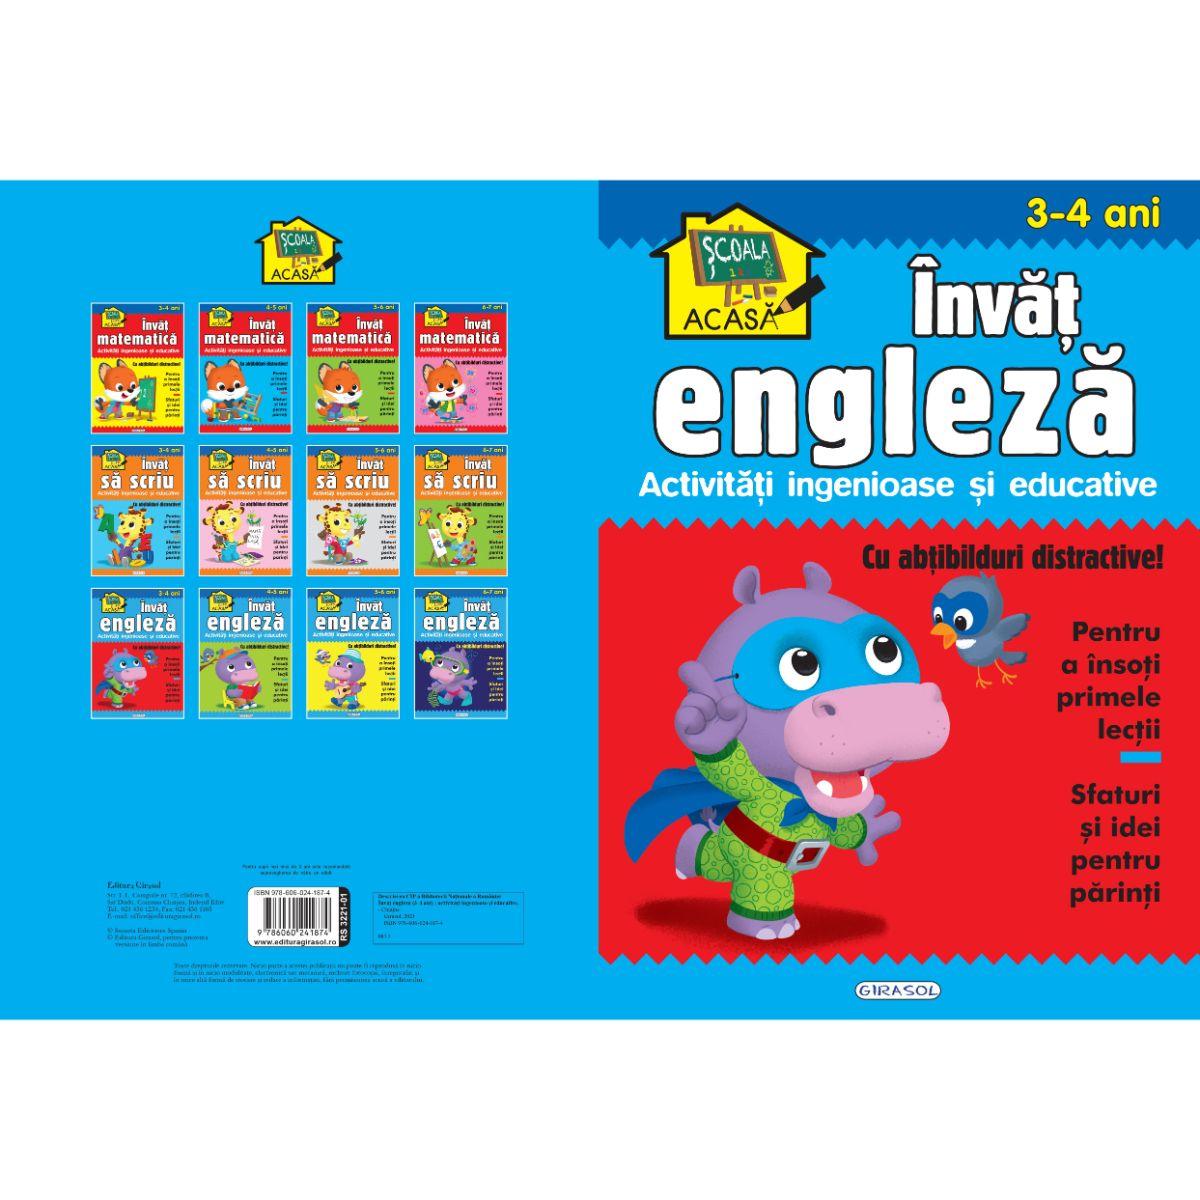 Scoala acasa, Invat engleza, 3-4 ani